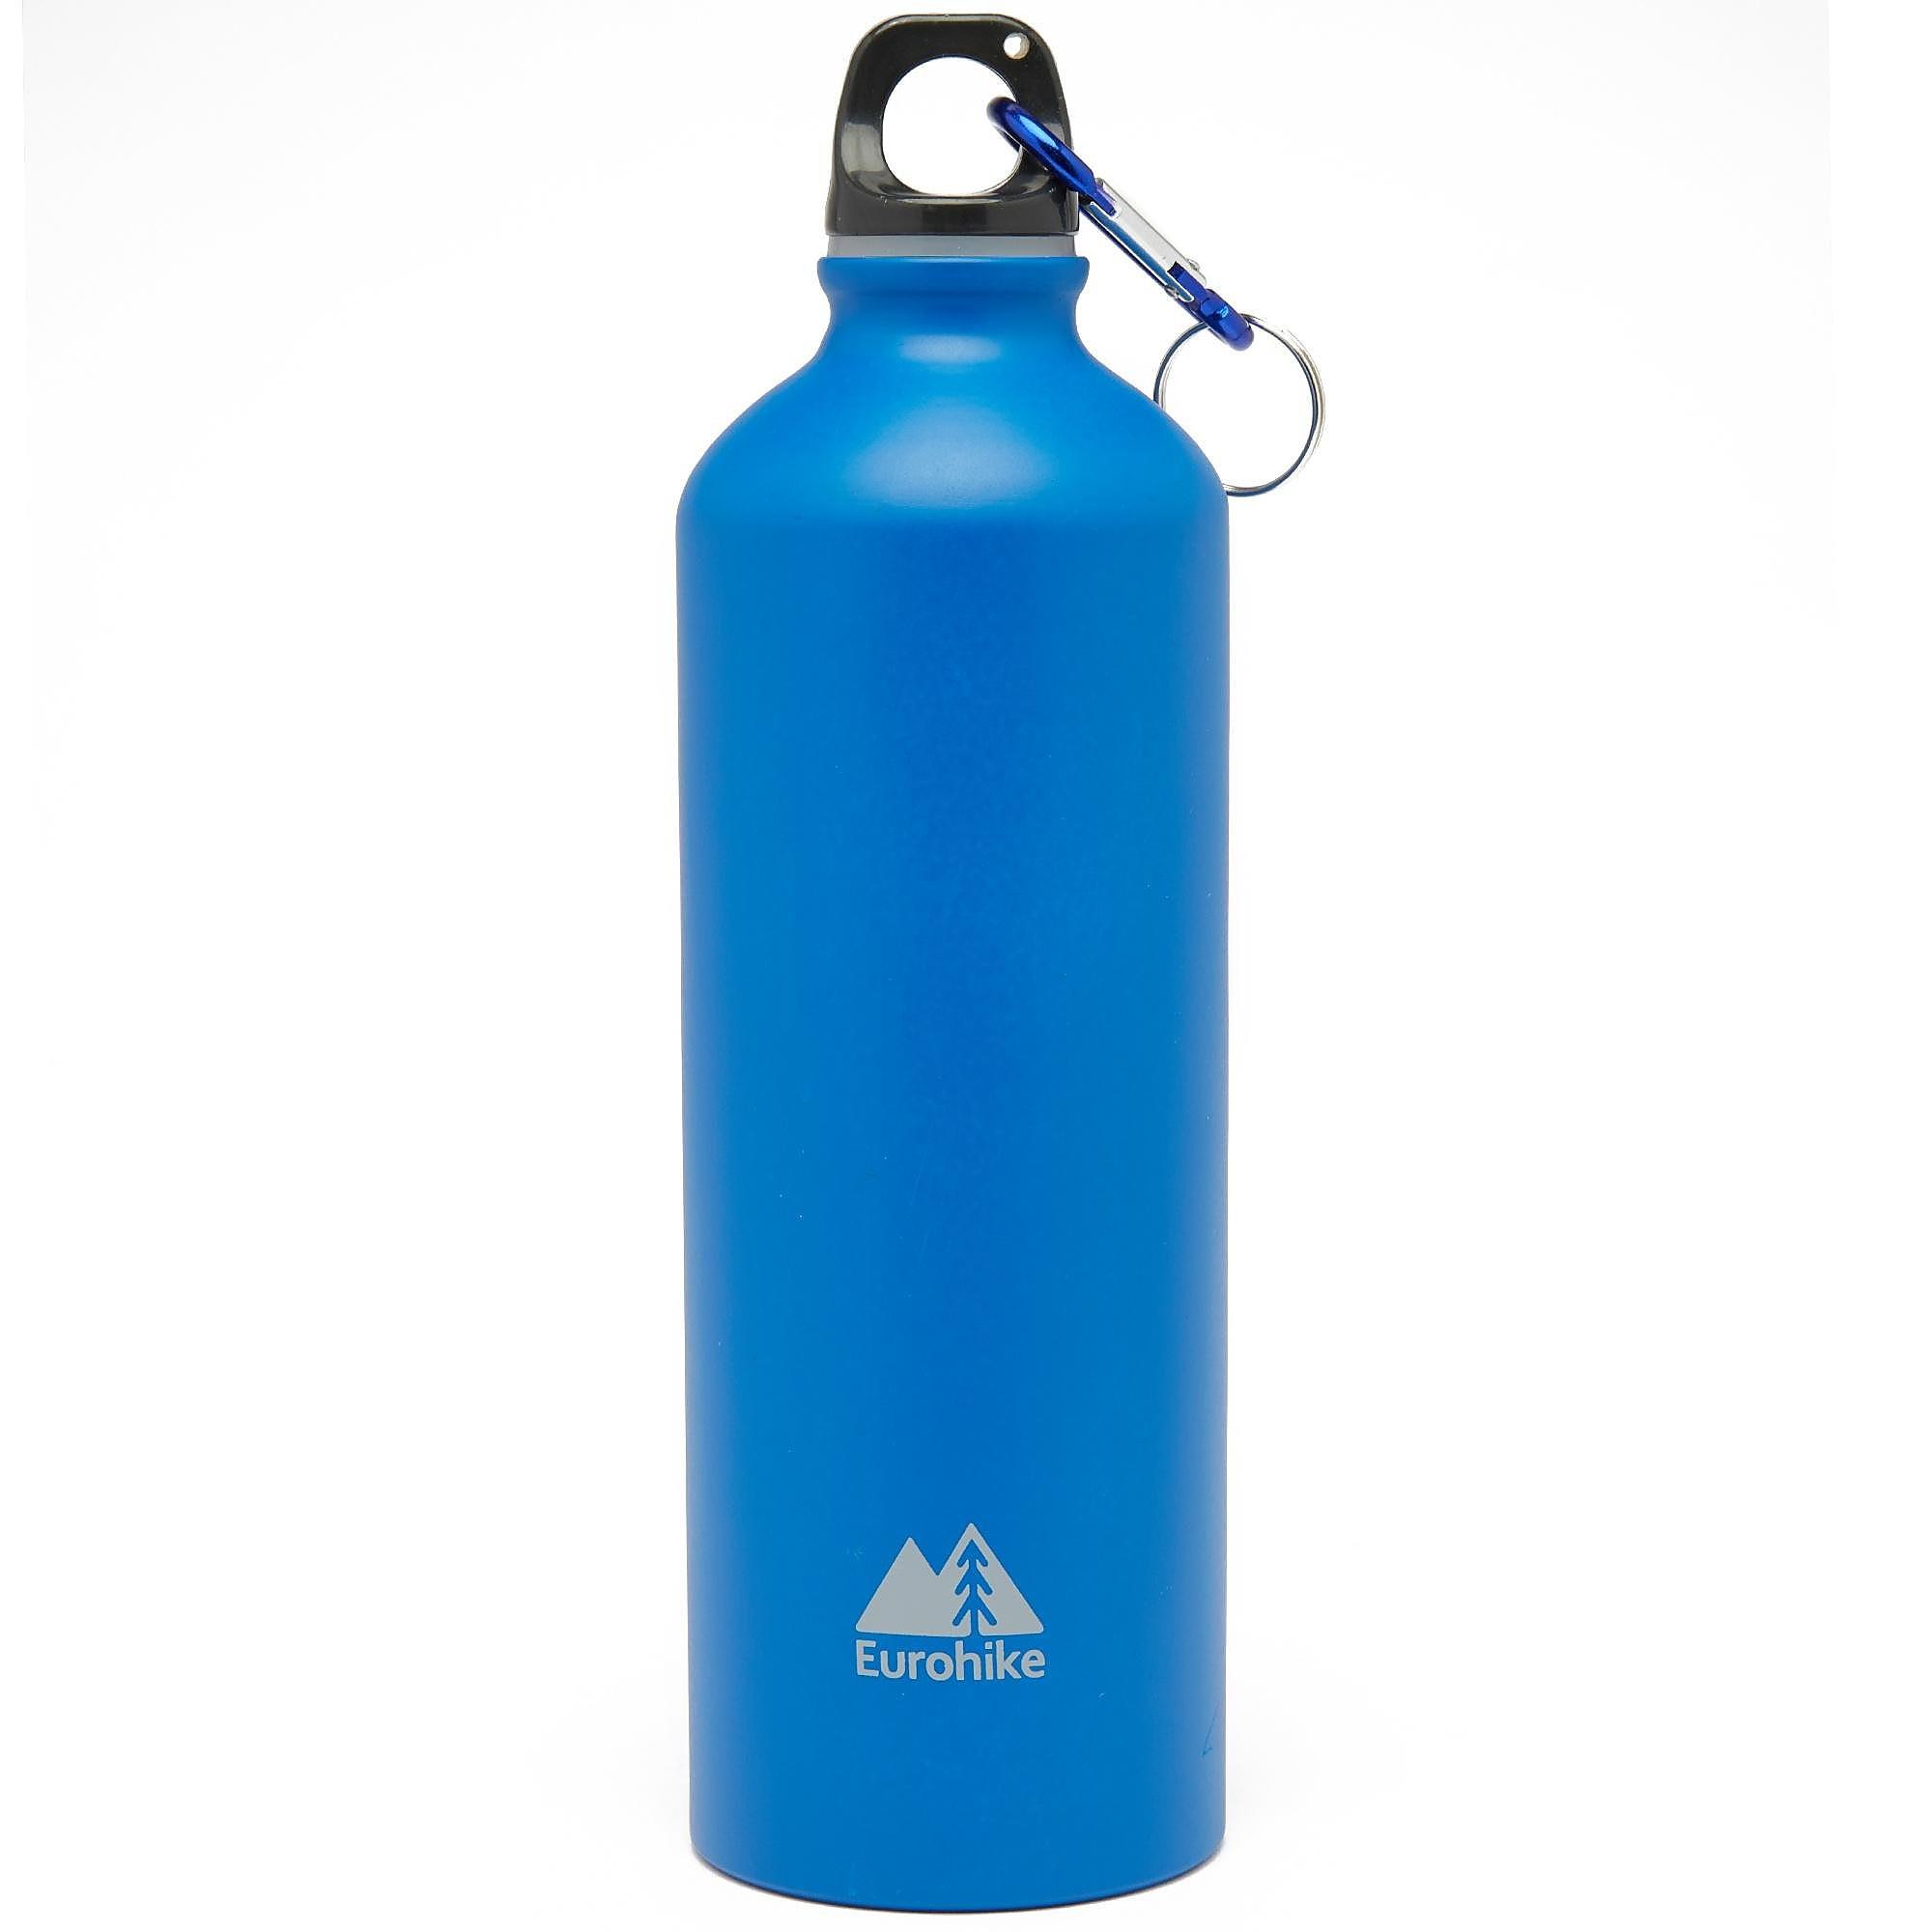 Eurohike Aqua 500ml Water Bottle